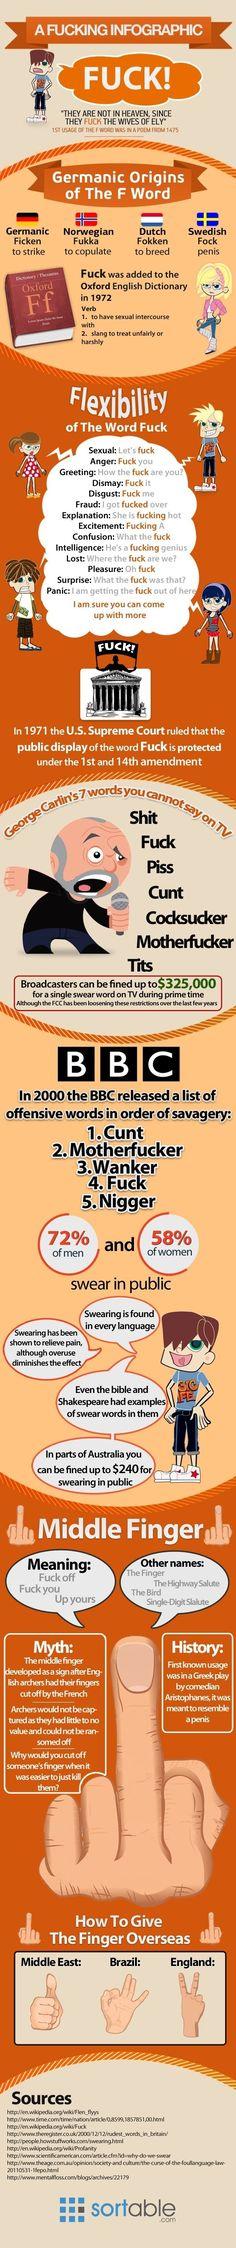 A F**king Infographic - funny pictures - funny photos - funny images - funny pics - funny quotes - funny animals   Read More Funny:    http://wdb.es/?utm_campaign=wdb.esutm_medium=pinterestutm_source=pinterst-descriptionutm_content=utm_term=